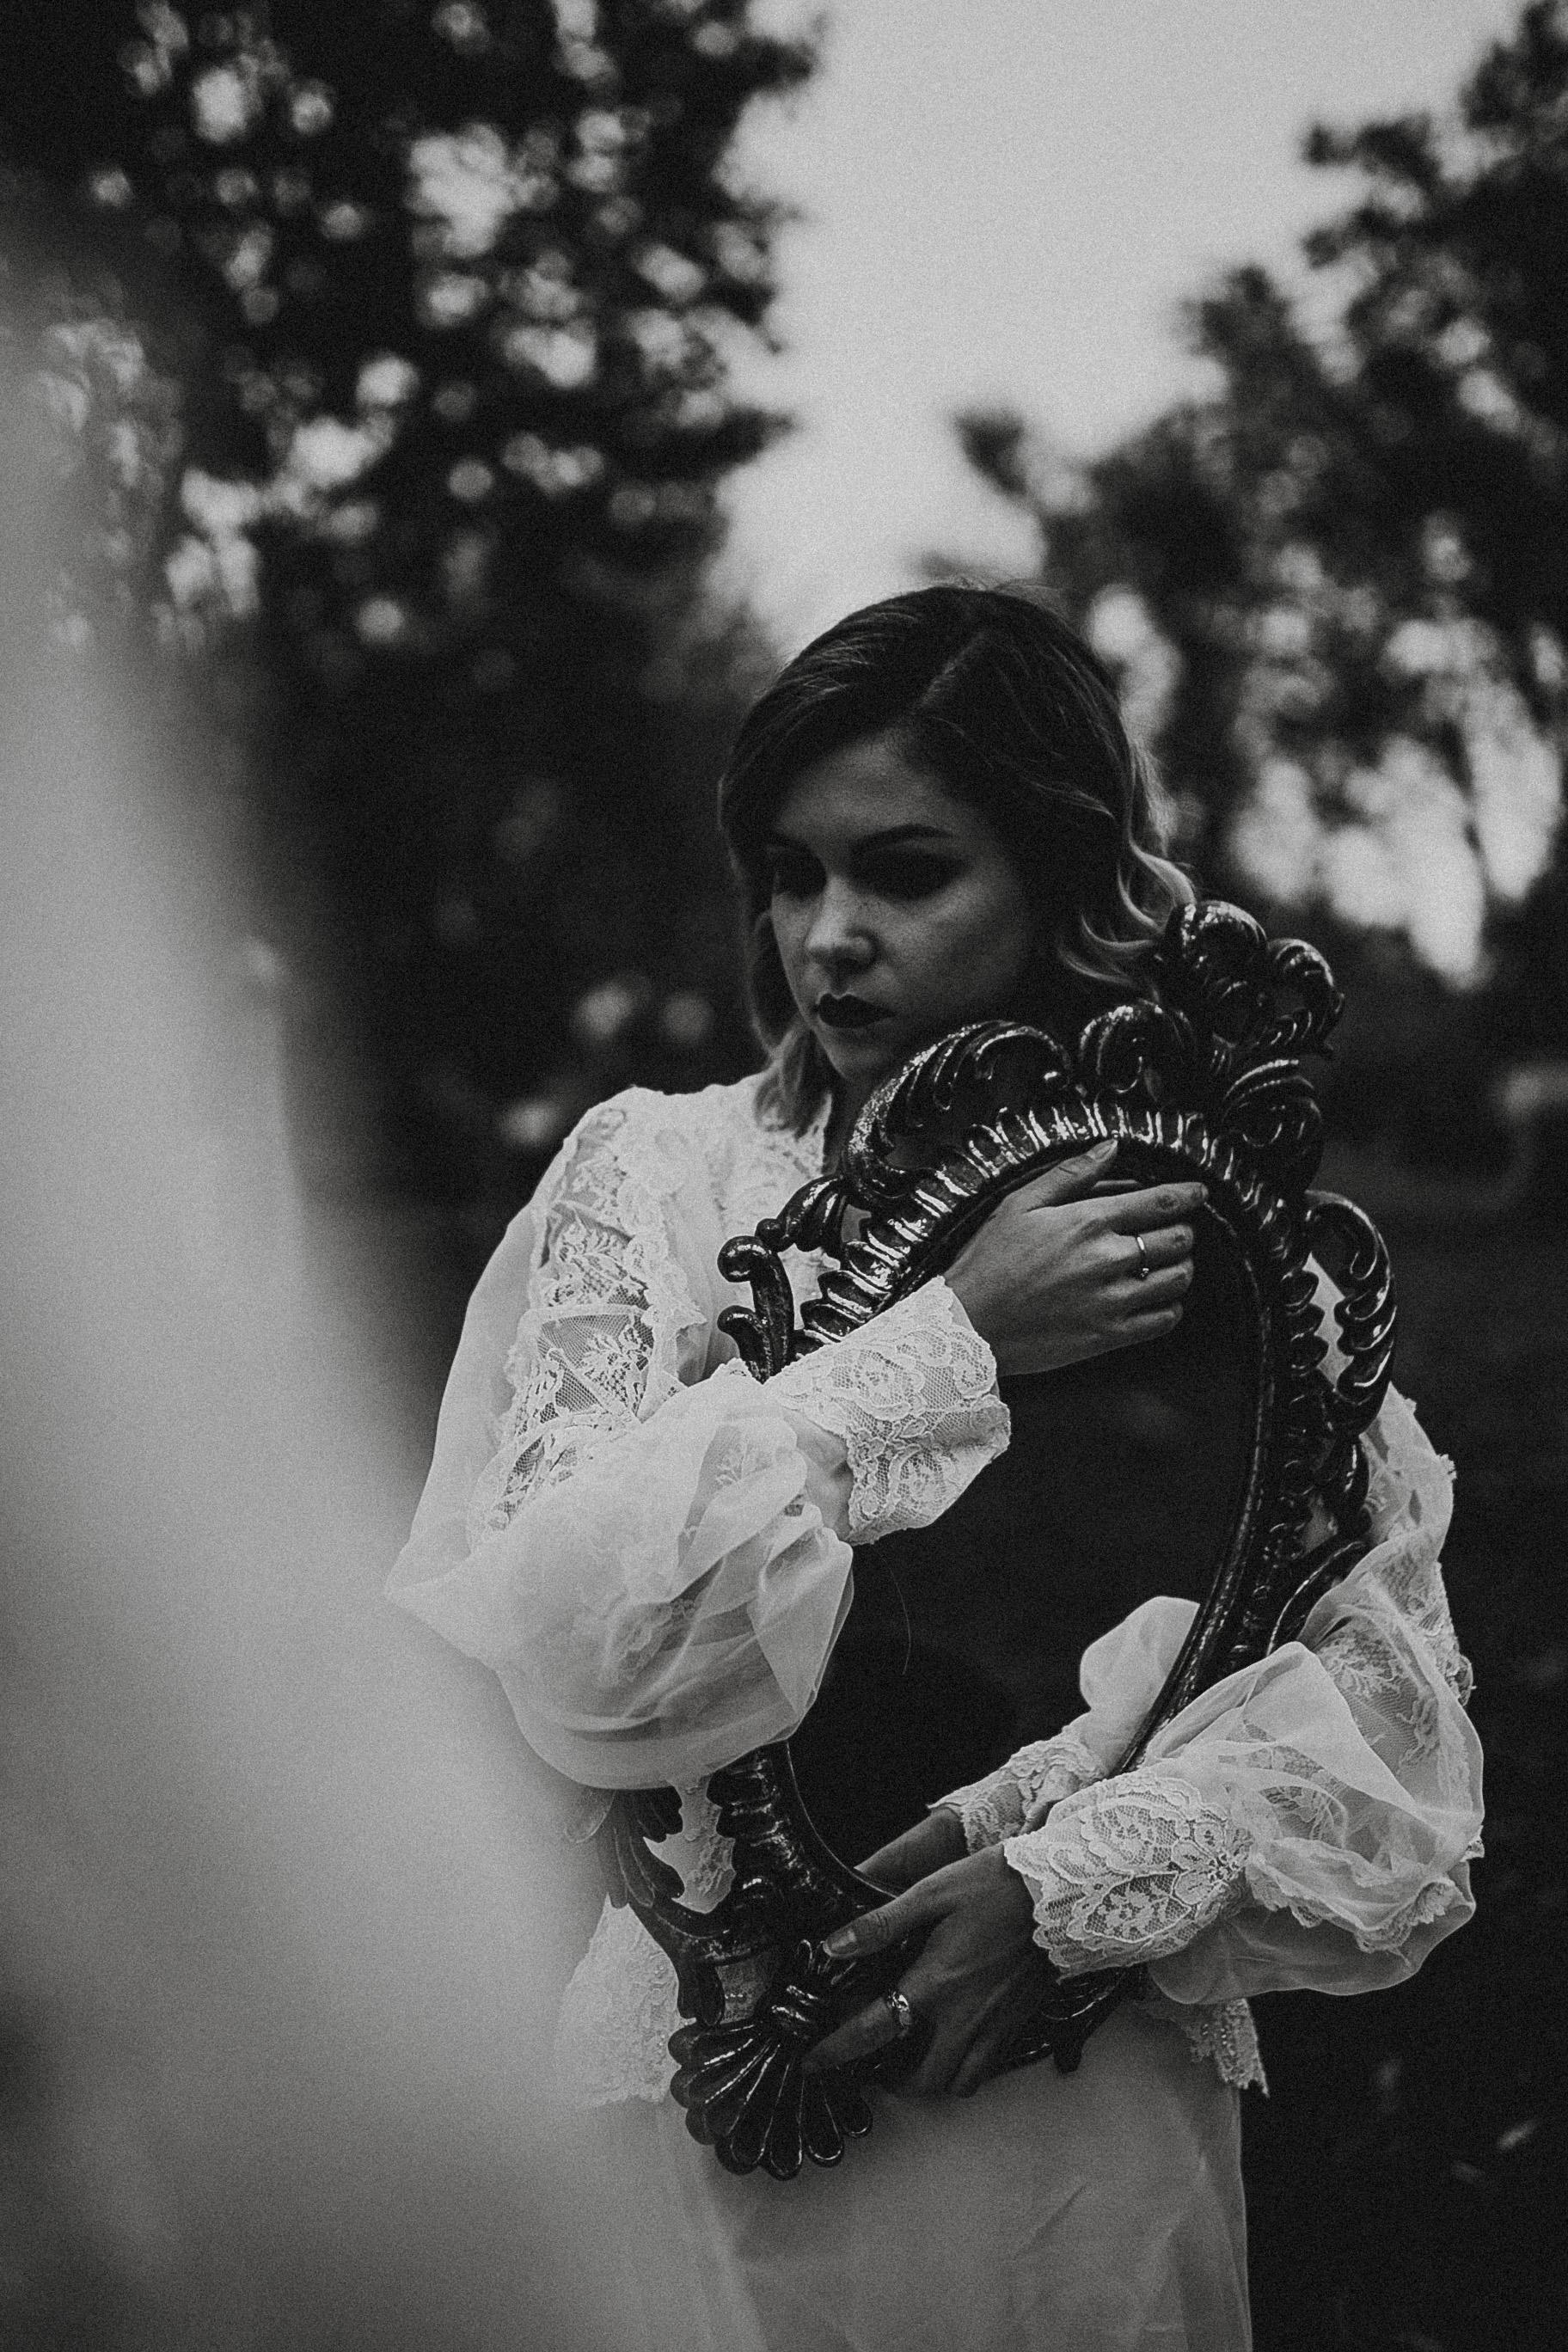 HALLOWEEN-REAGANLYNNPHOTOGRAPHY-INDIANAPOLIS-INDIANA-17.jpg